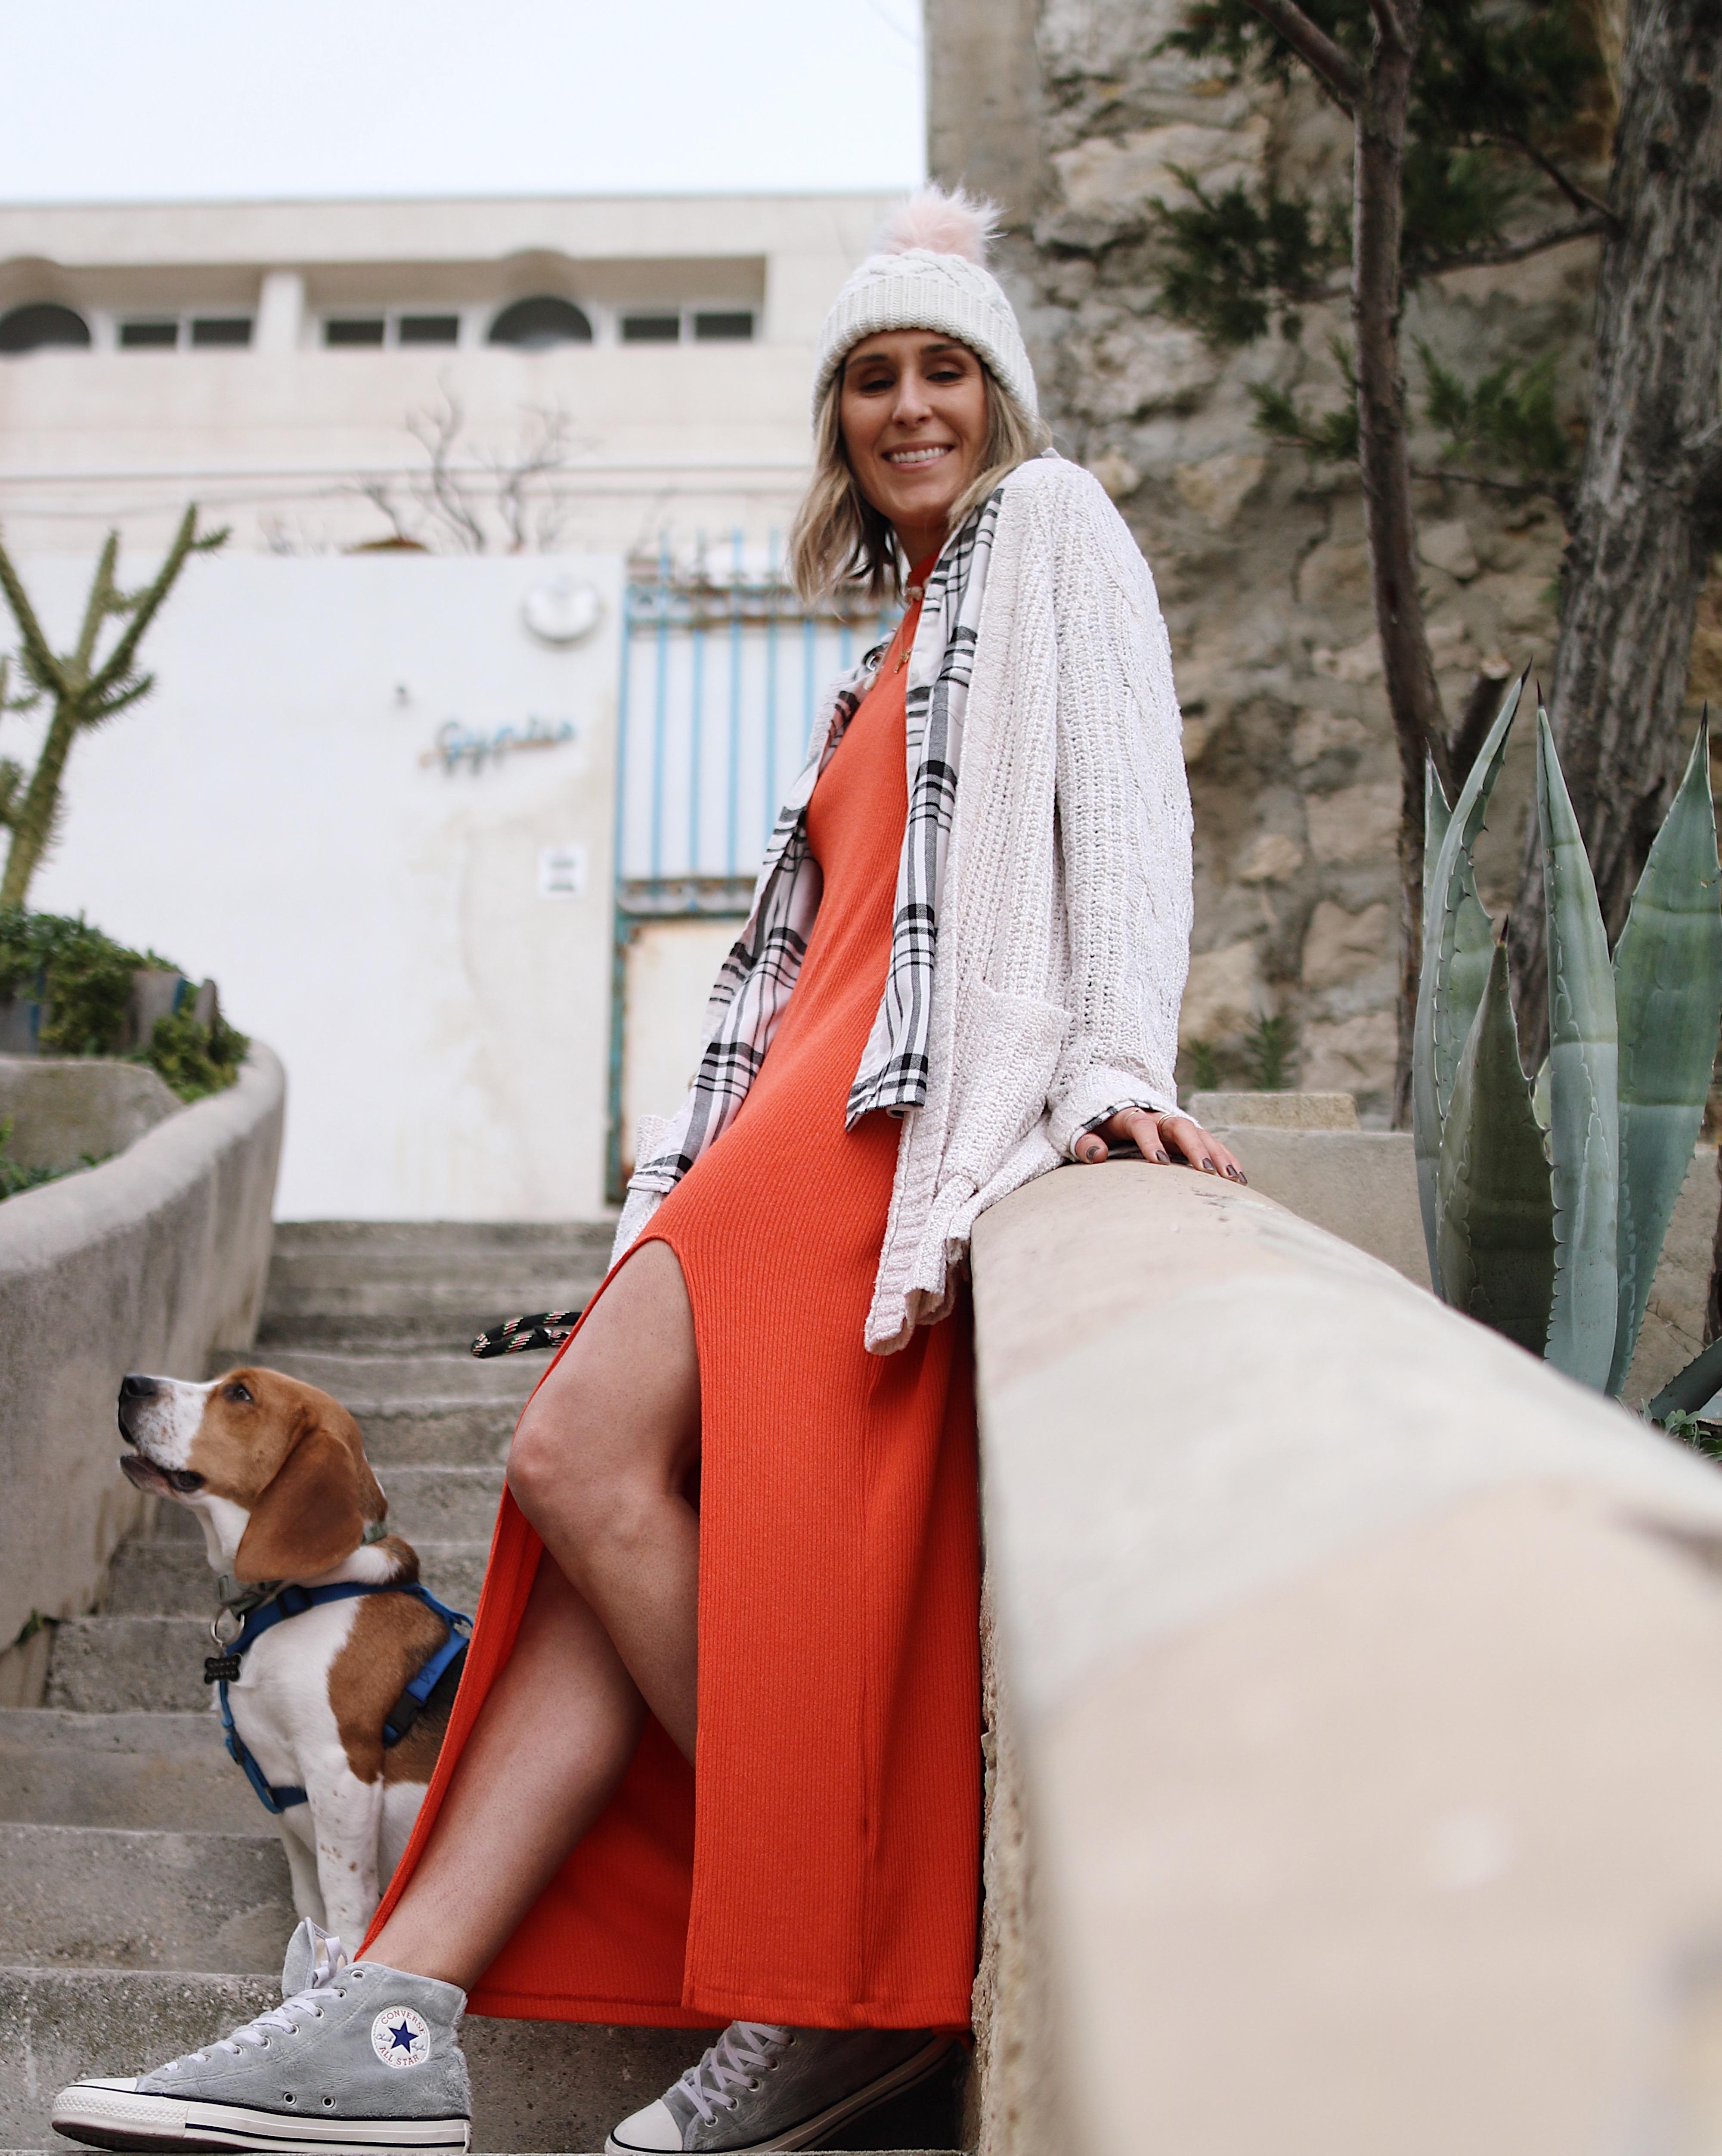 MAXI CORAIL - Chon & CHON - www.chonandchon.com - maxi dress, robe longue fente zara ornage corail